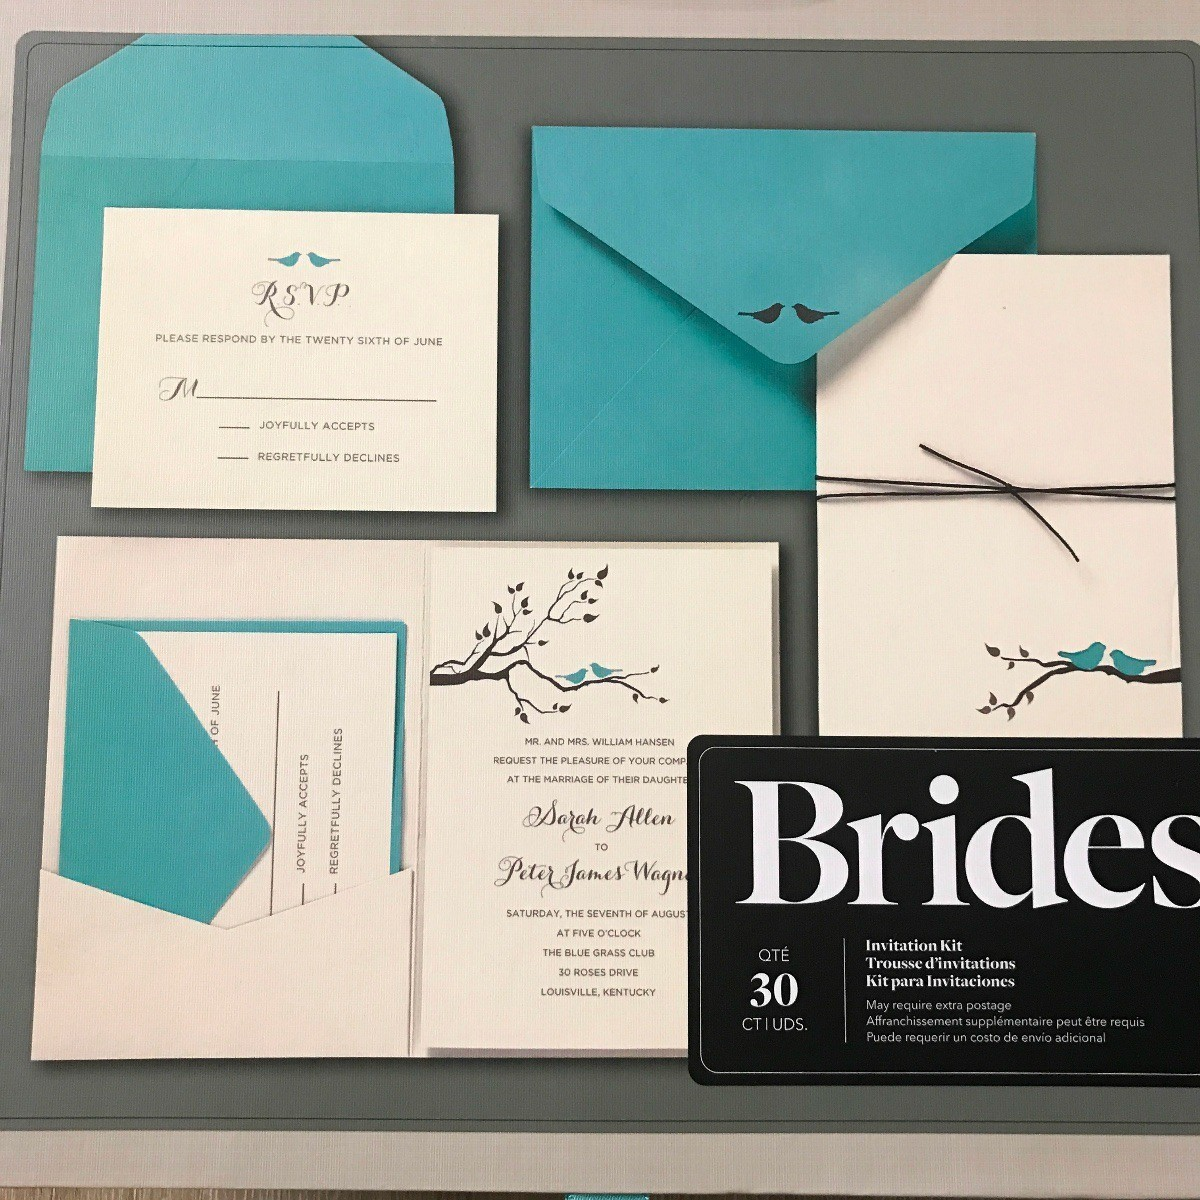 Printable Wedding Invitations Kits: Using A Printable Kit For Wedding Invitations